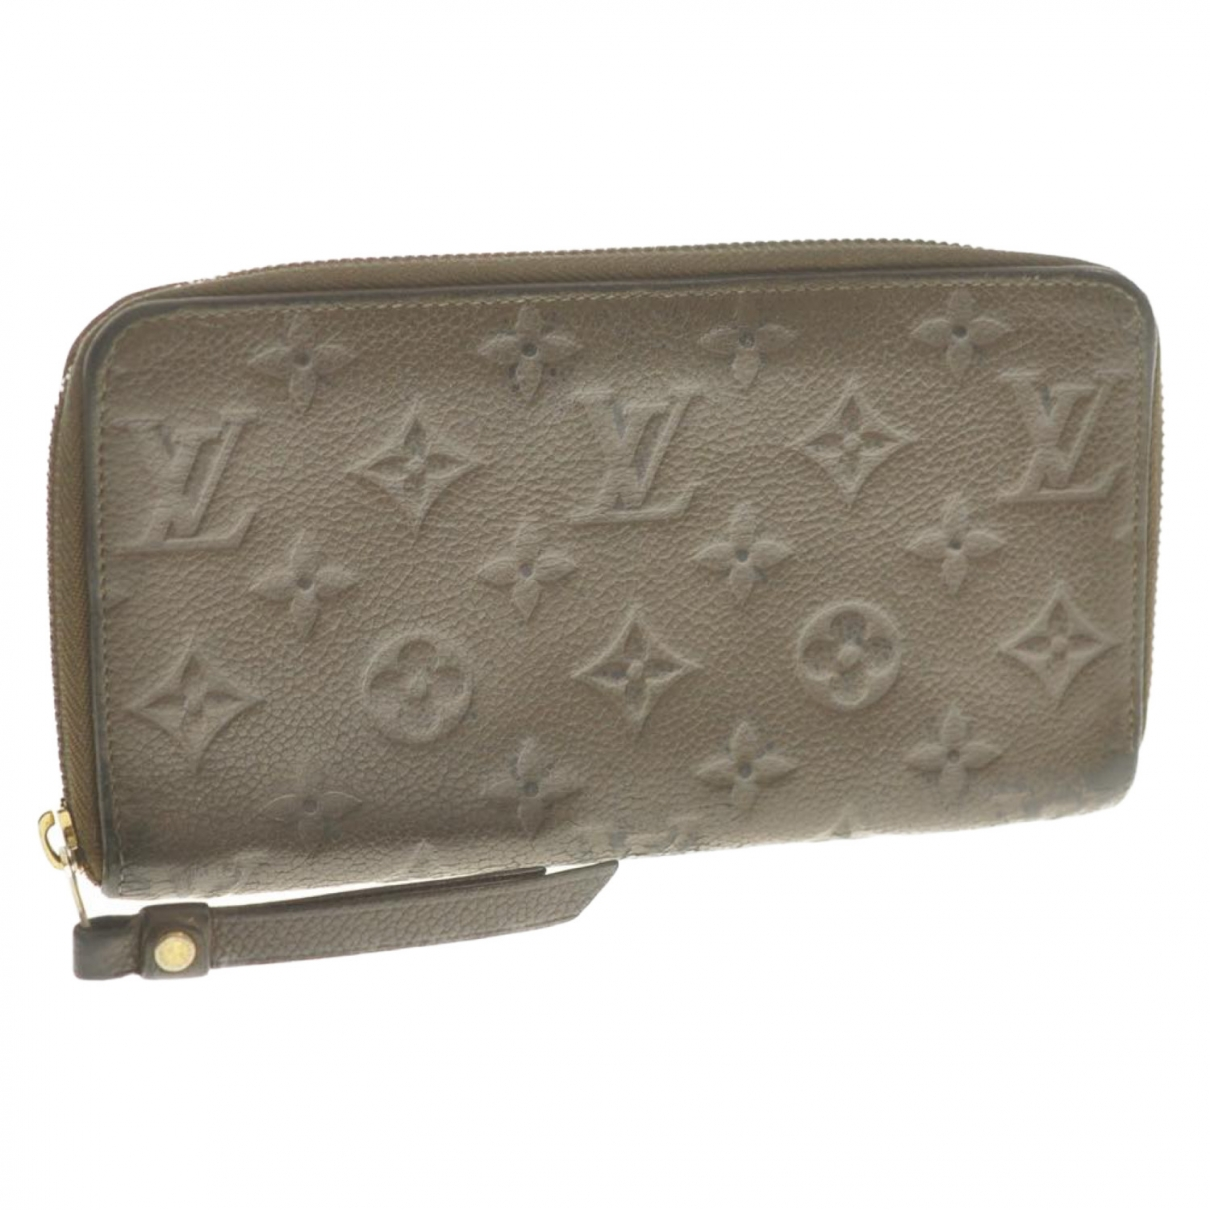 Louis Vuitton \N Black Leather Purses, wallet & cases for Women \N